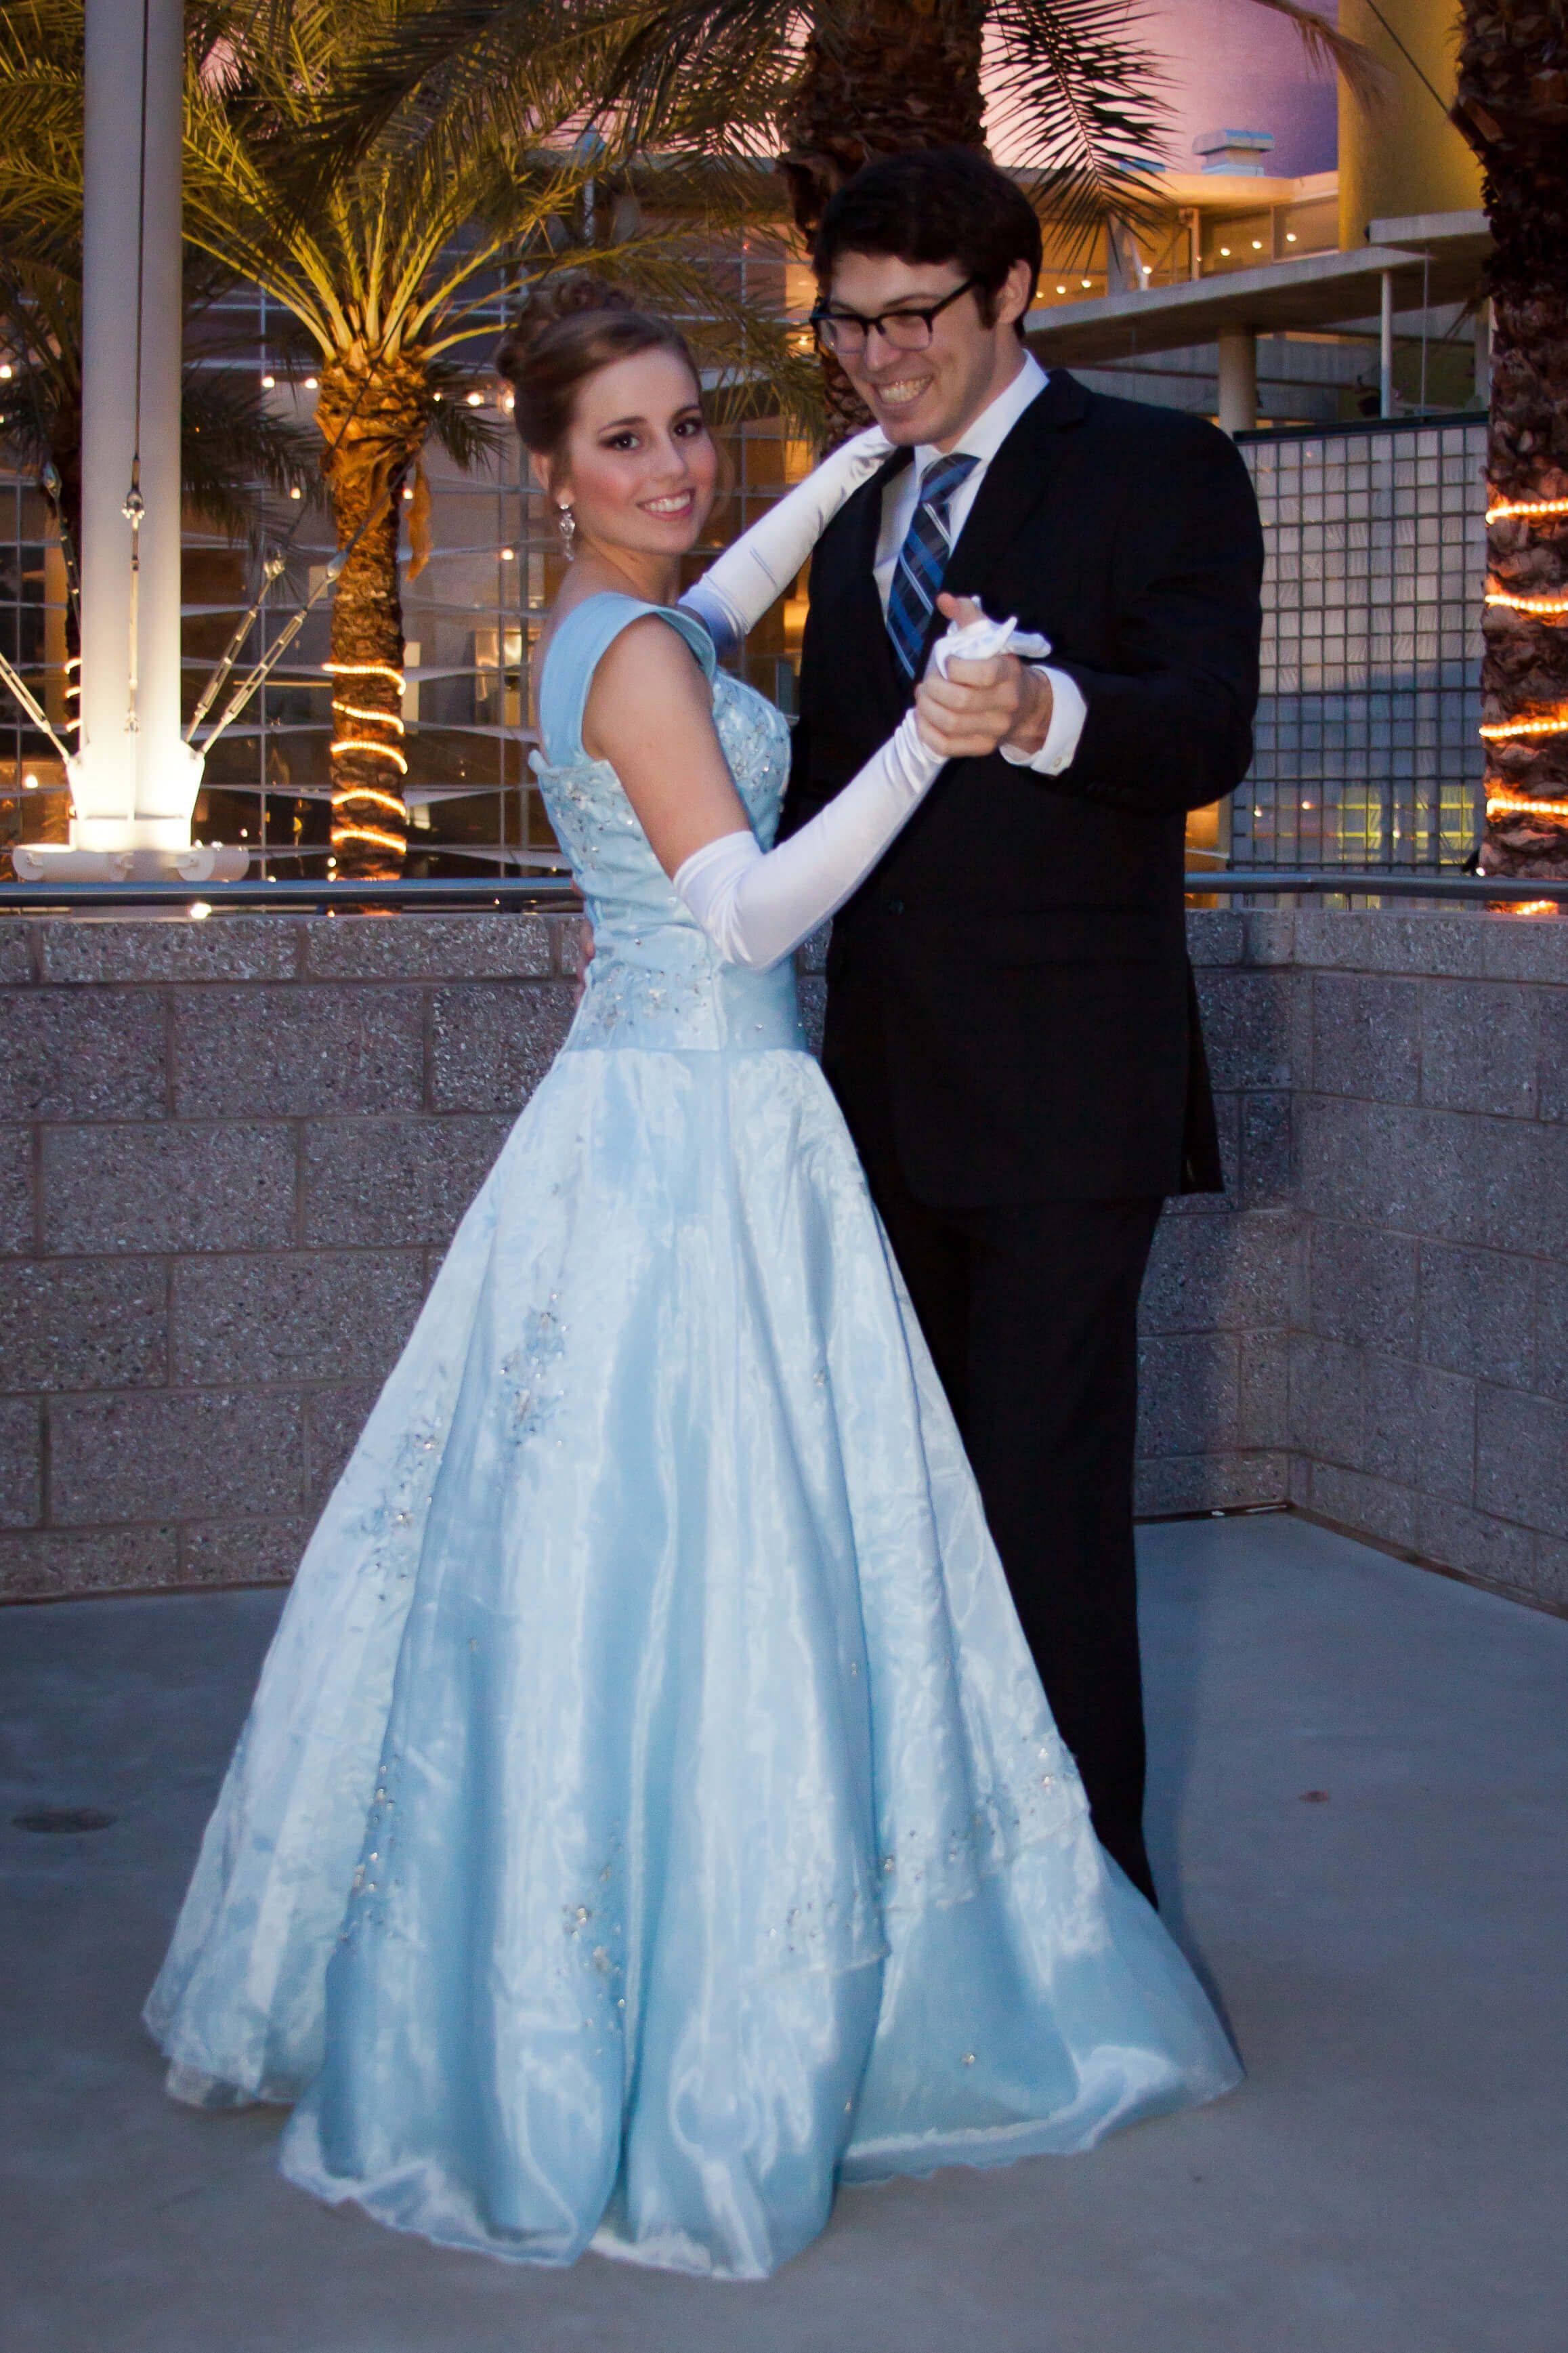 Ella Modest Prom Dress - Blue Modest Prom Dress - Prom Dress with ...